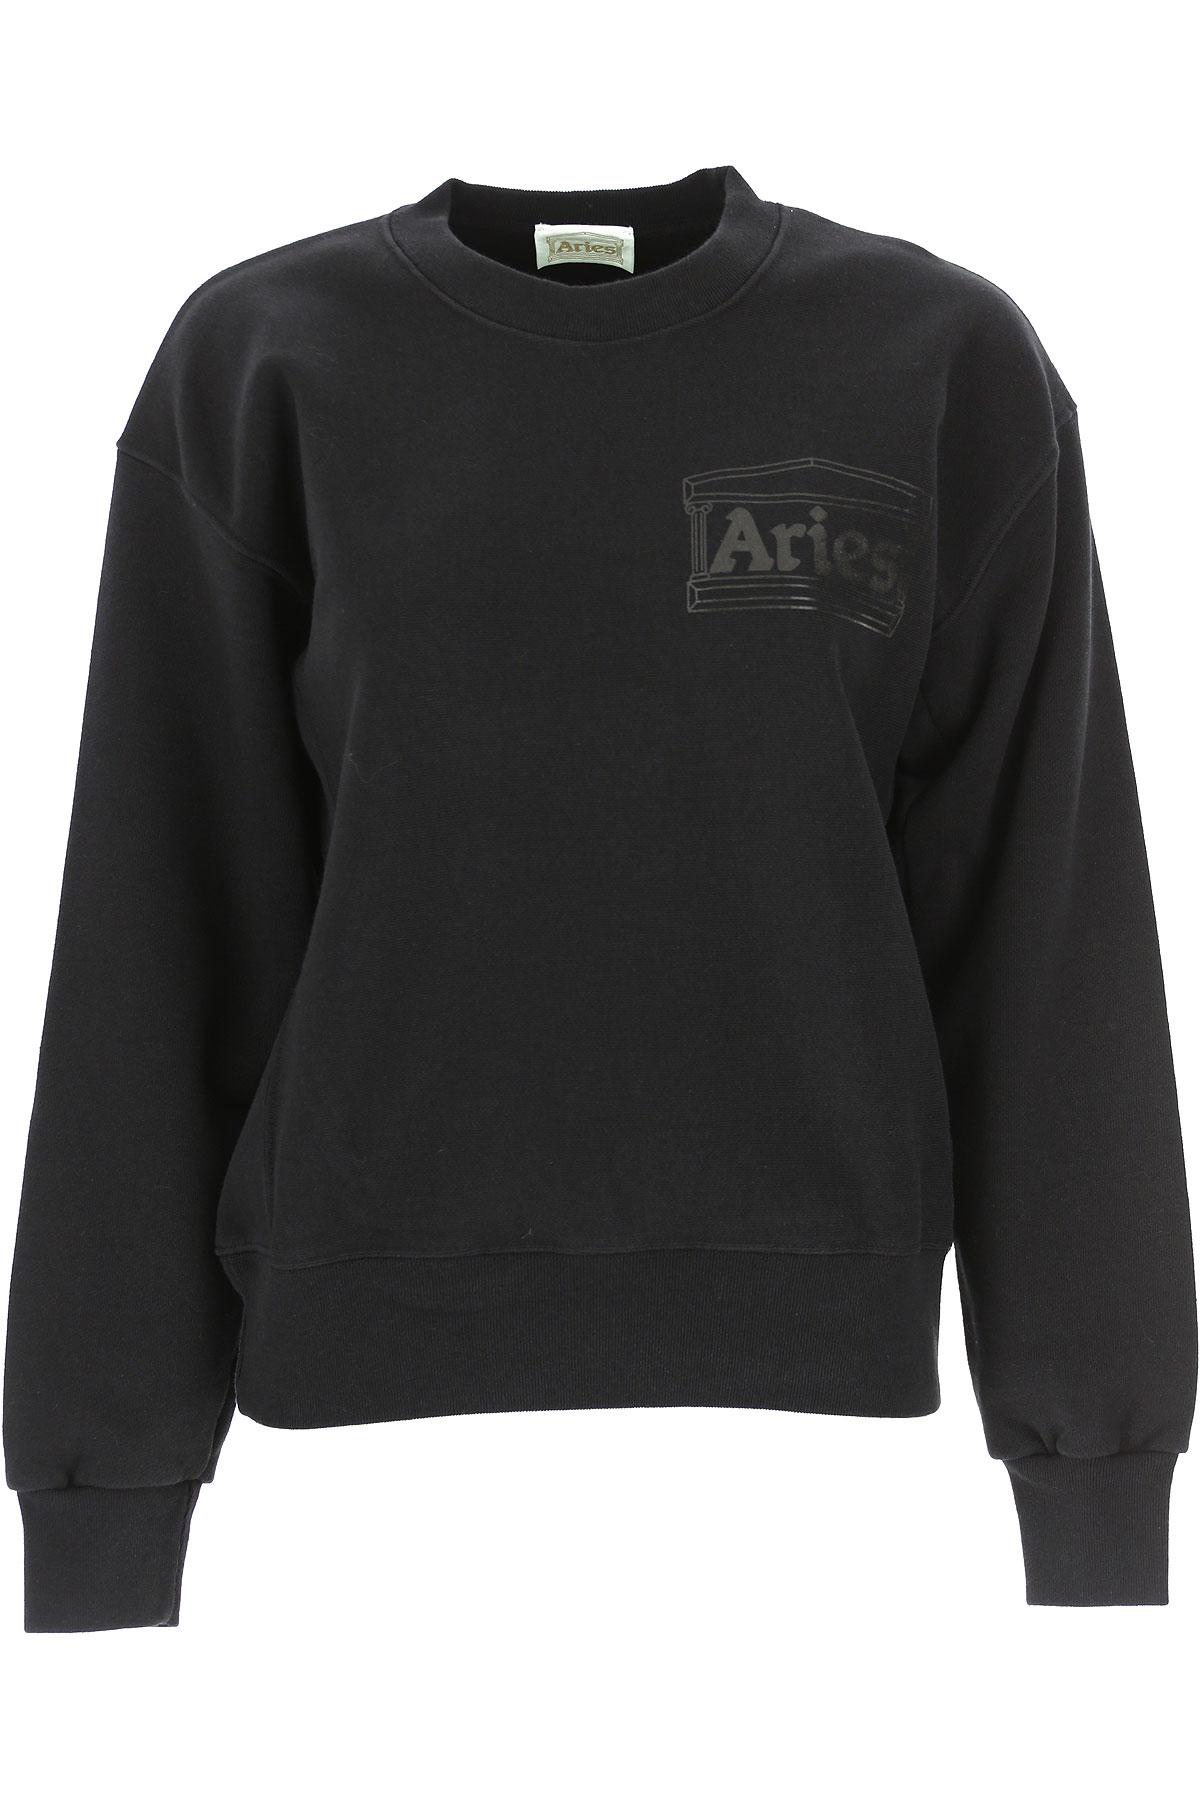 Aries Sweatshirt for Women On Sale, Black, Cotton, 2019, 4